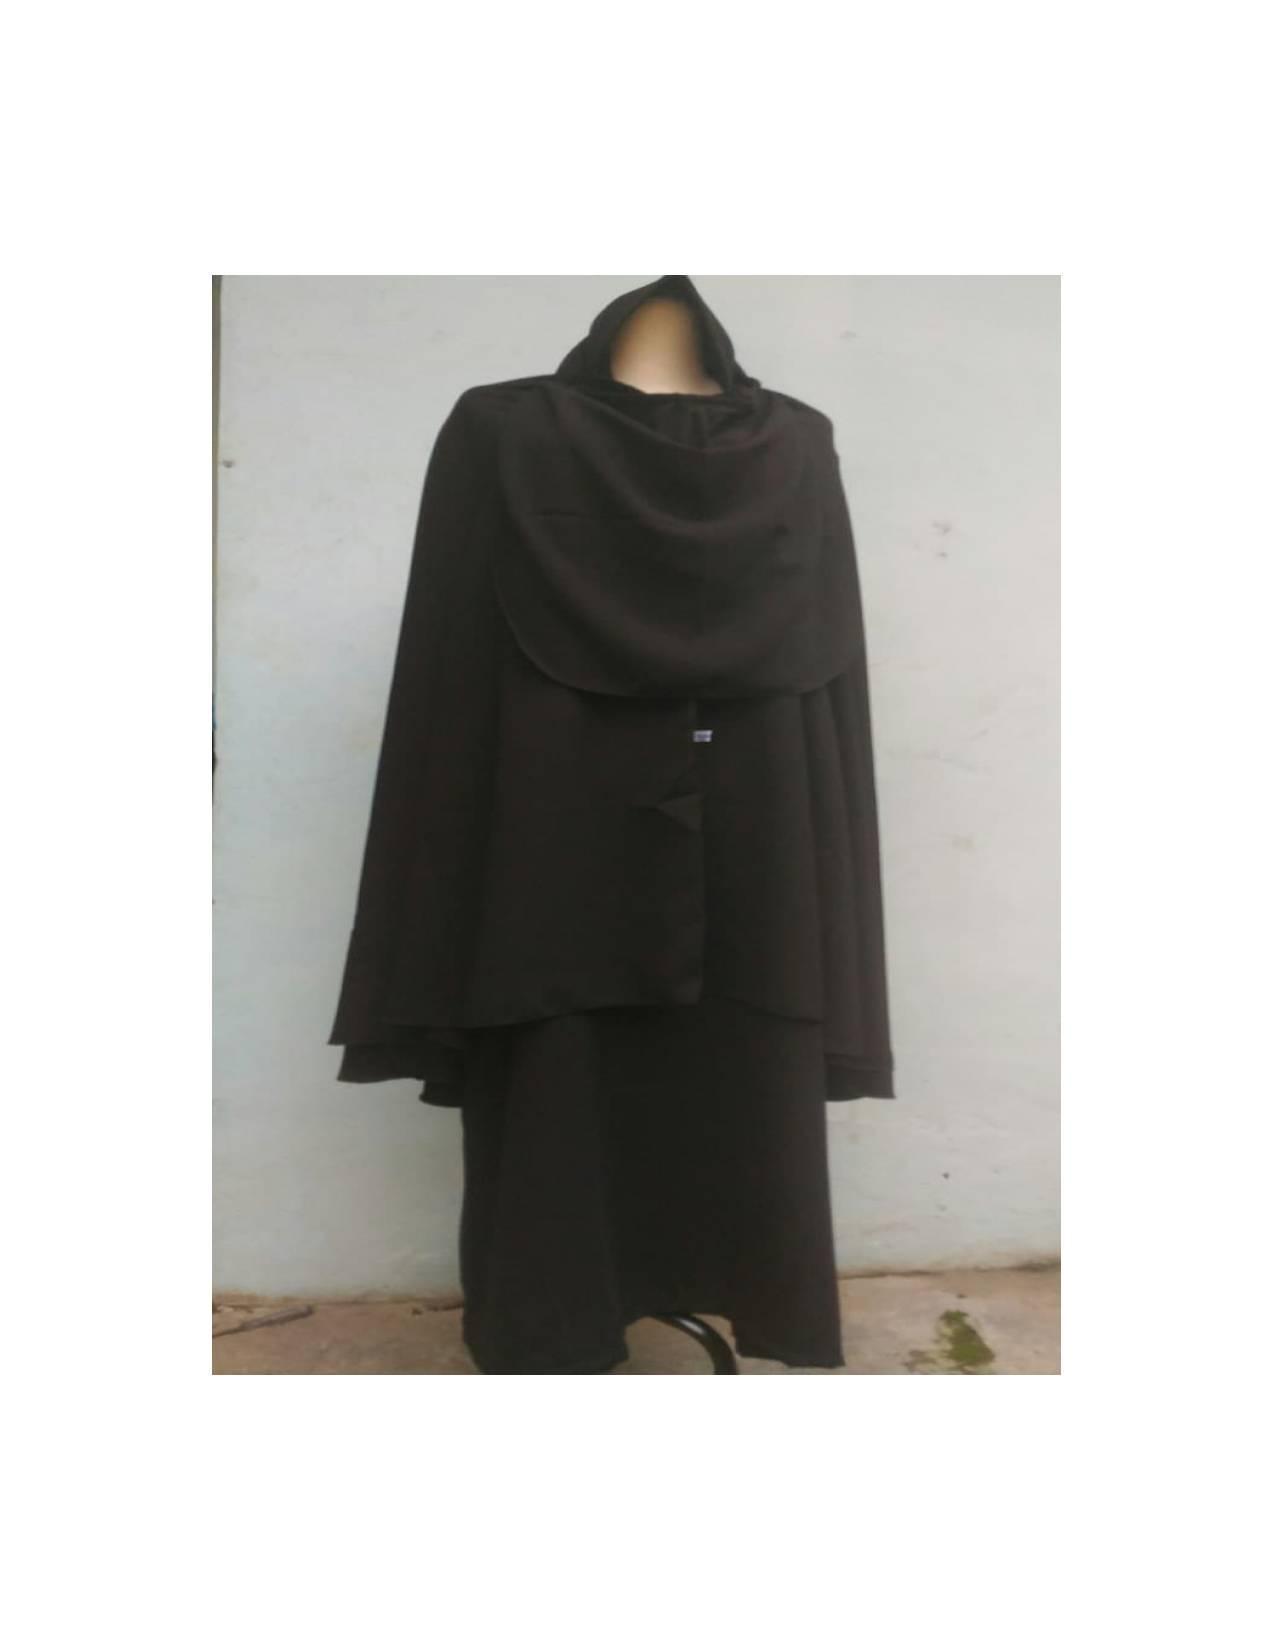 BAJU MUSLIM DRESS Setelan Gamis Polos Cadar Tali Jilbab warna hitam